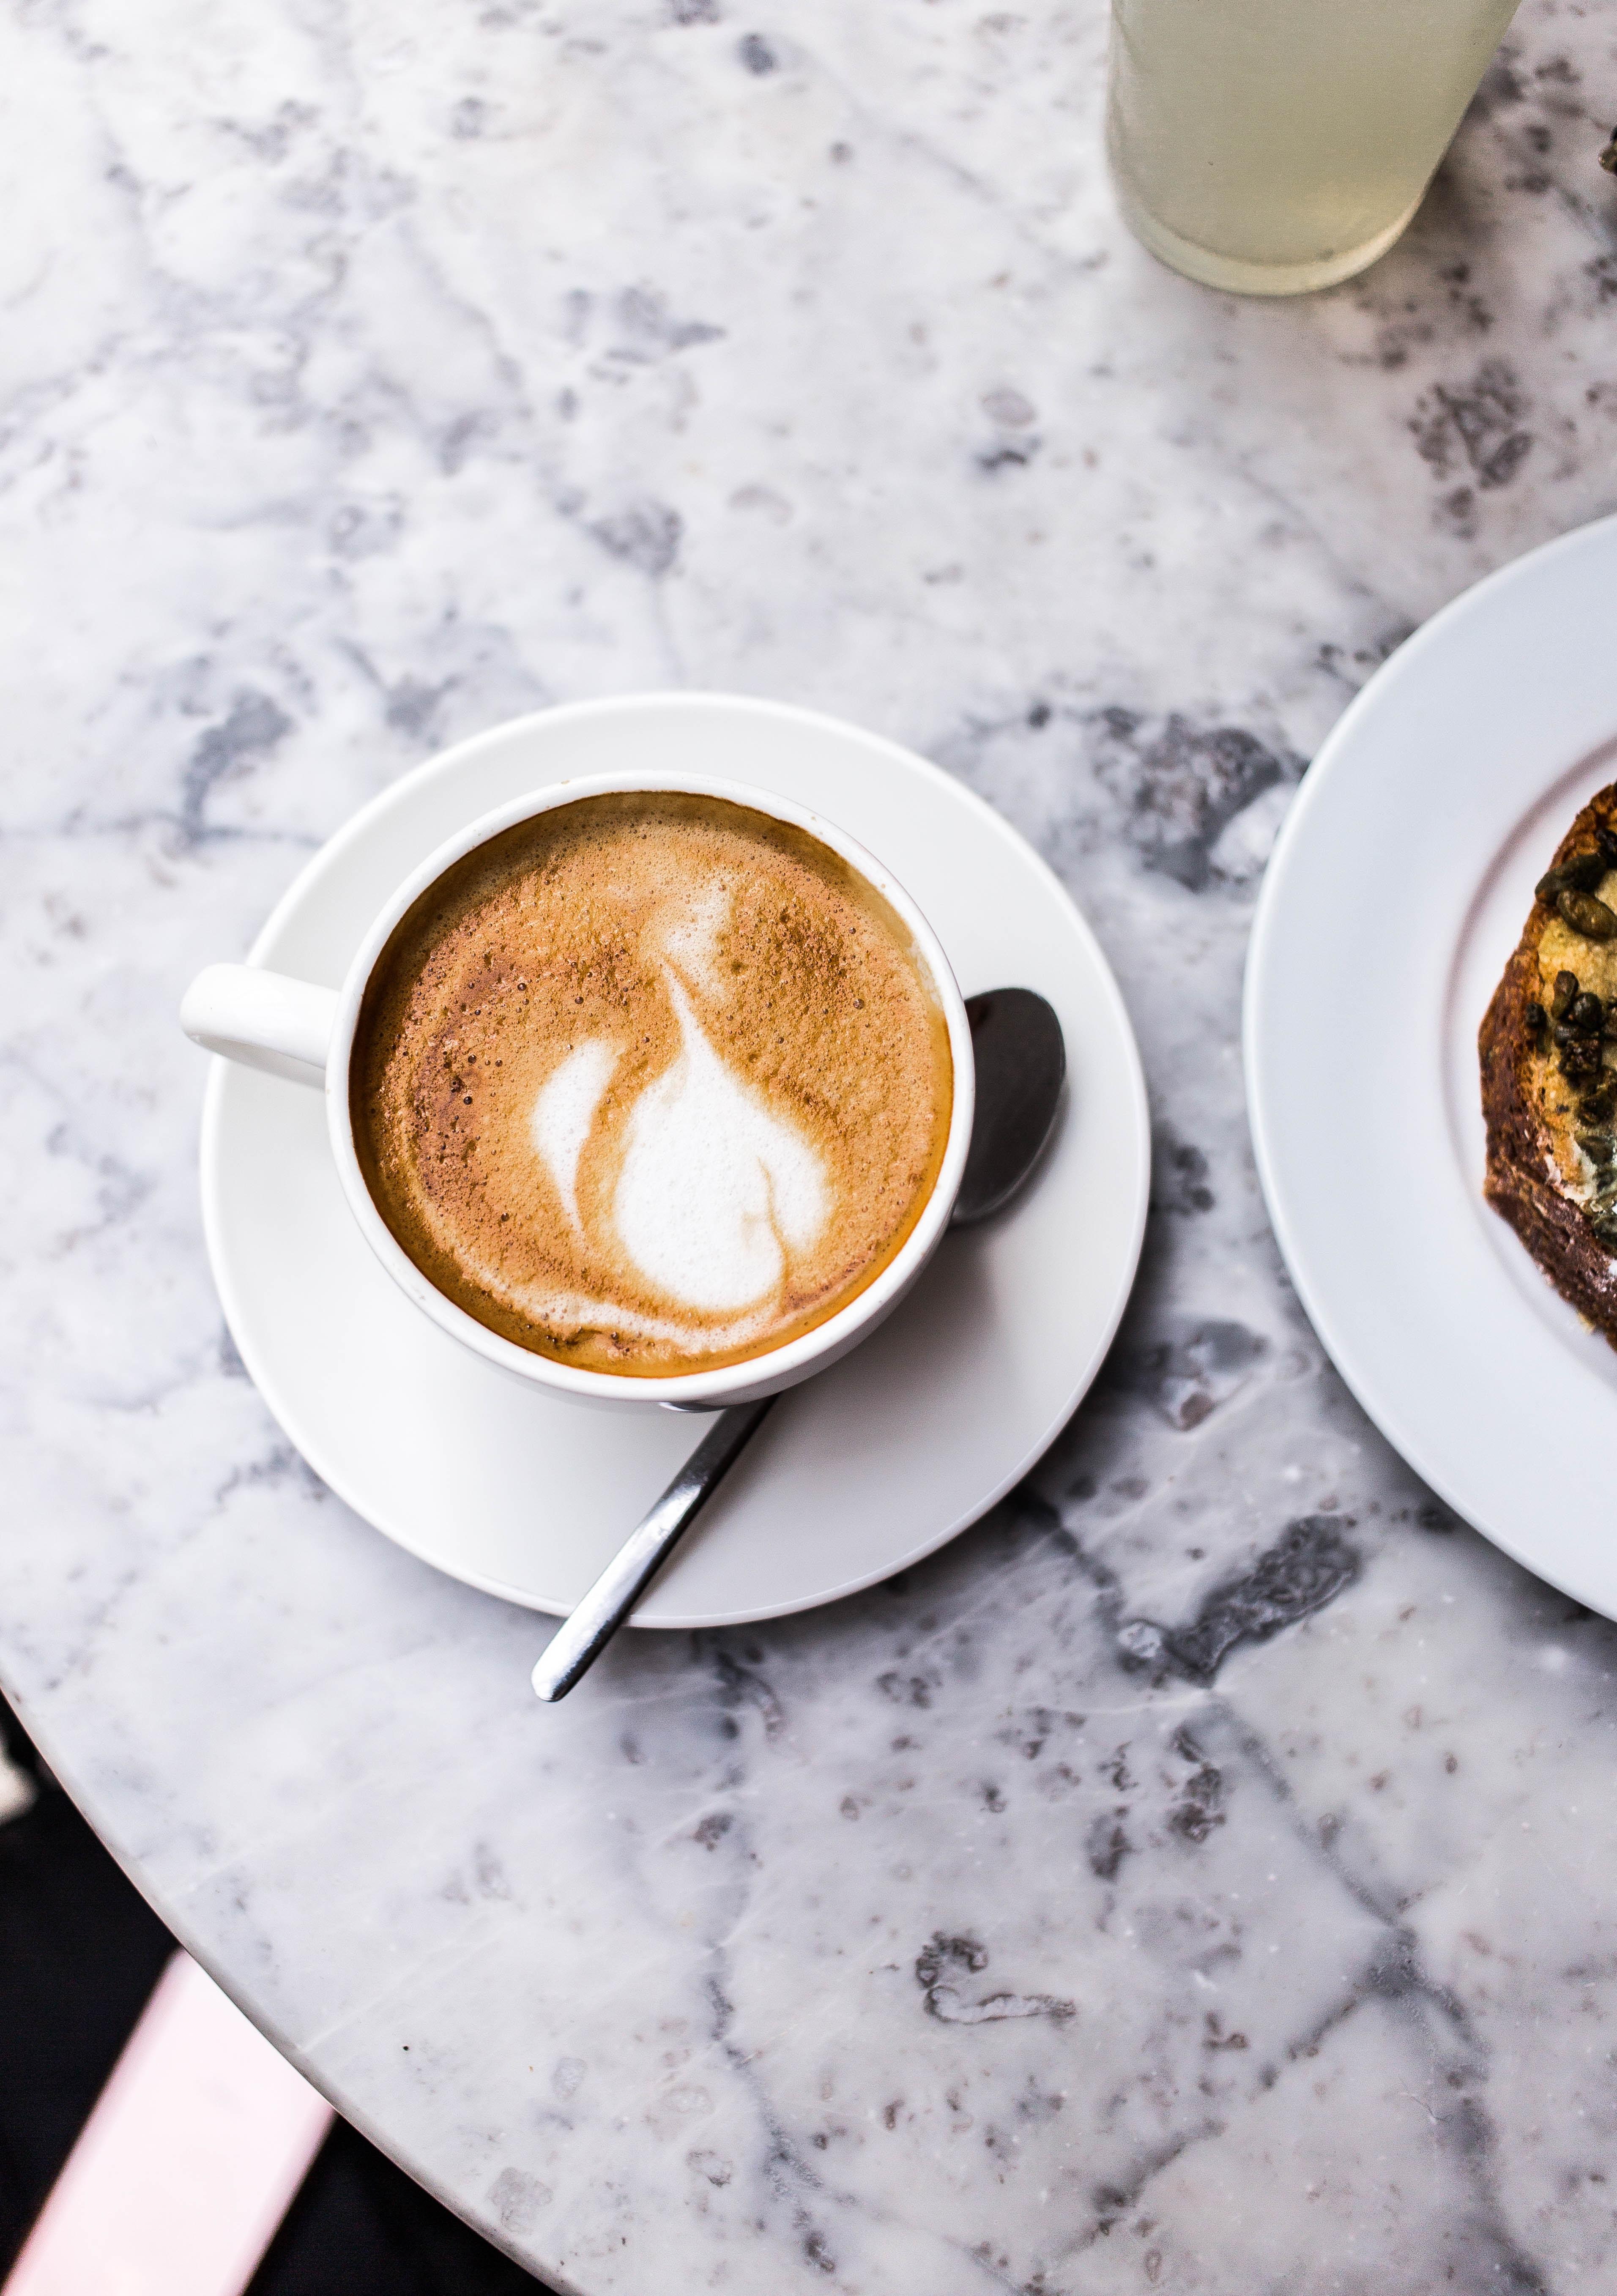 kawa z mlekiem, skutki picia kawy z mlekiem